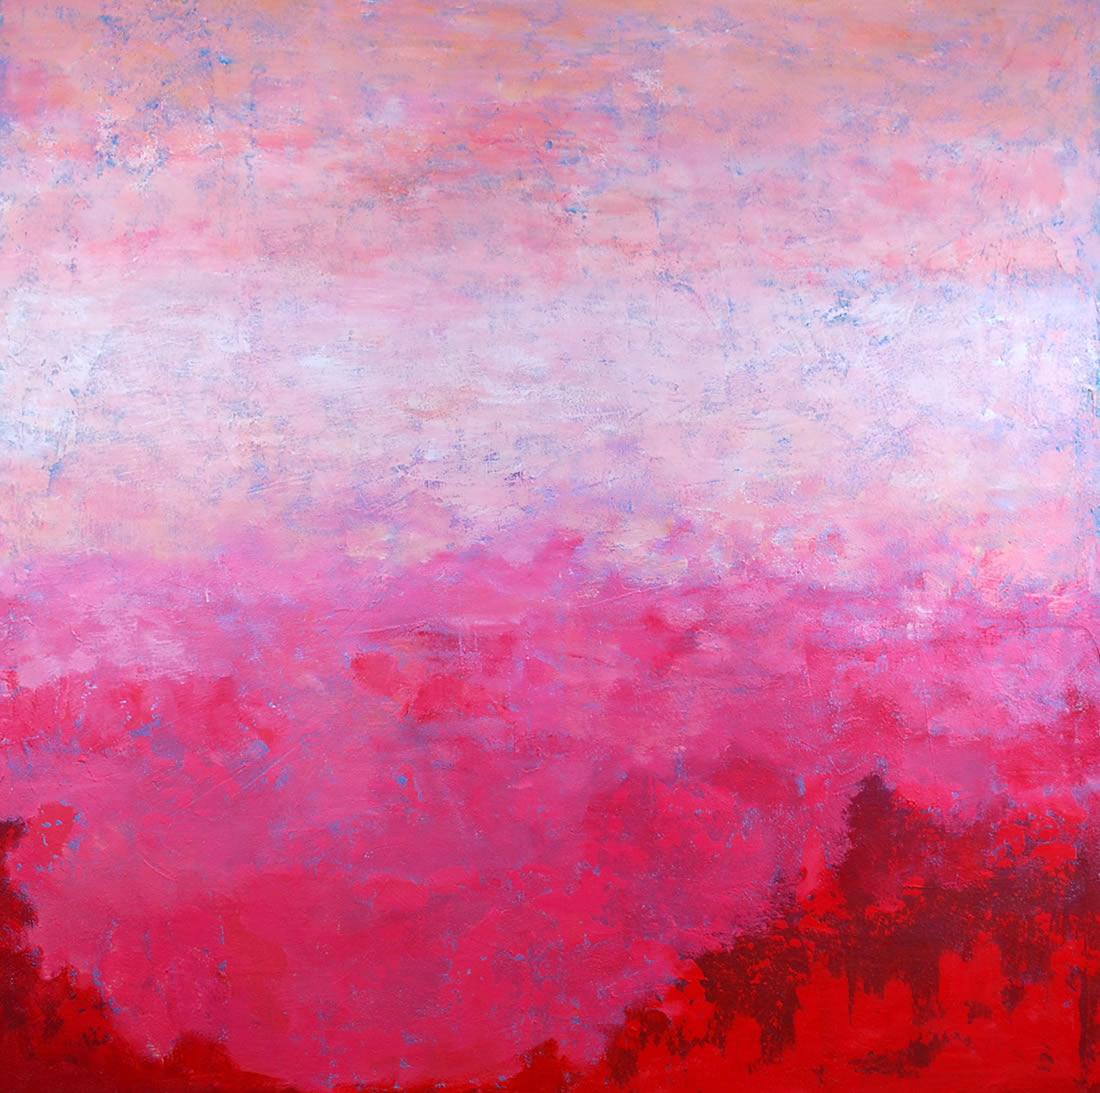 Übergang, 130x130 cm, 2013, Acryl auf Leinwand